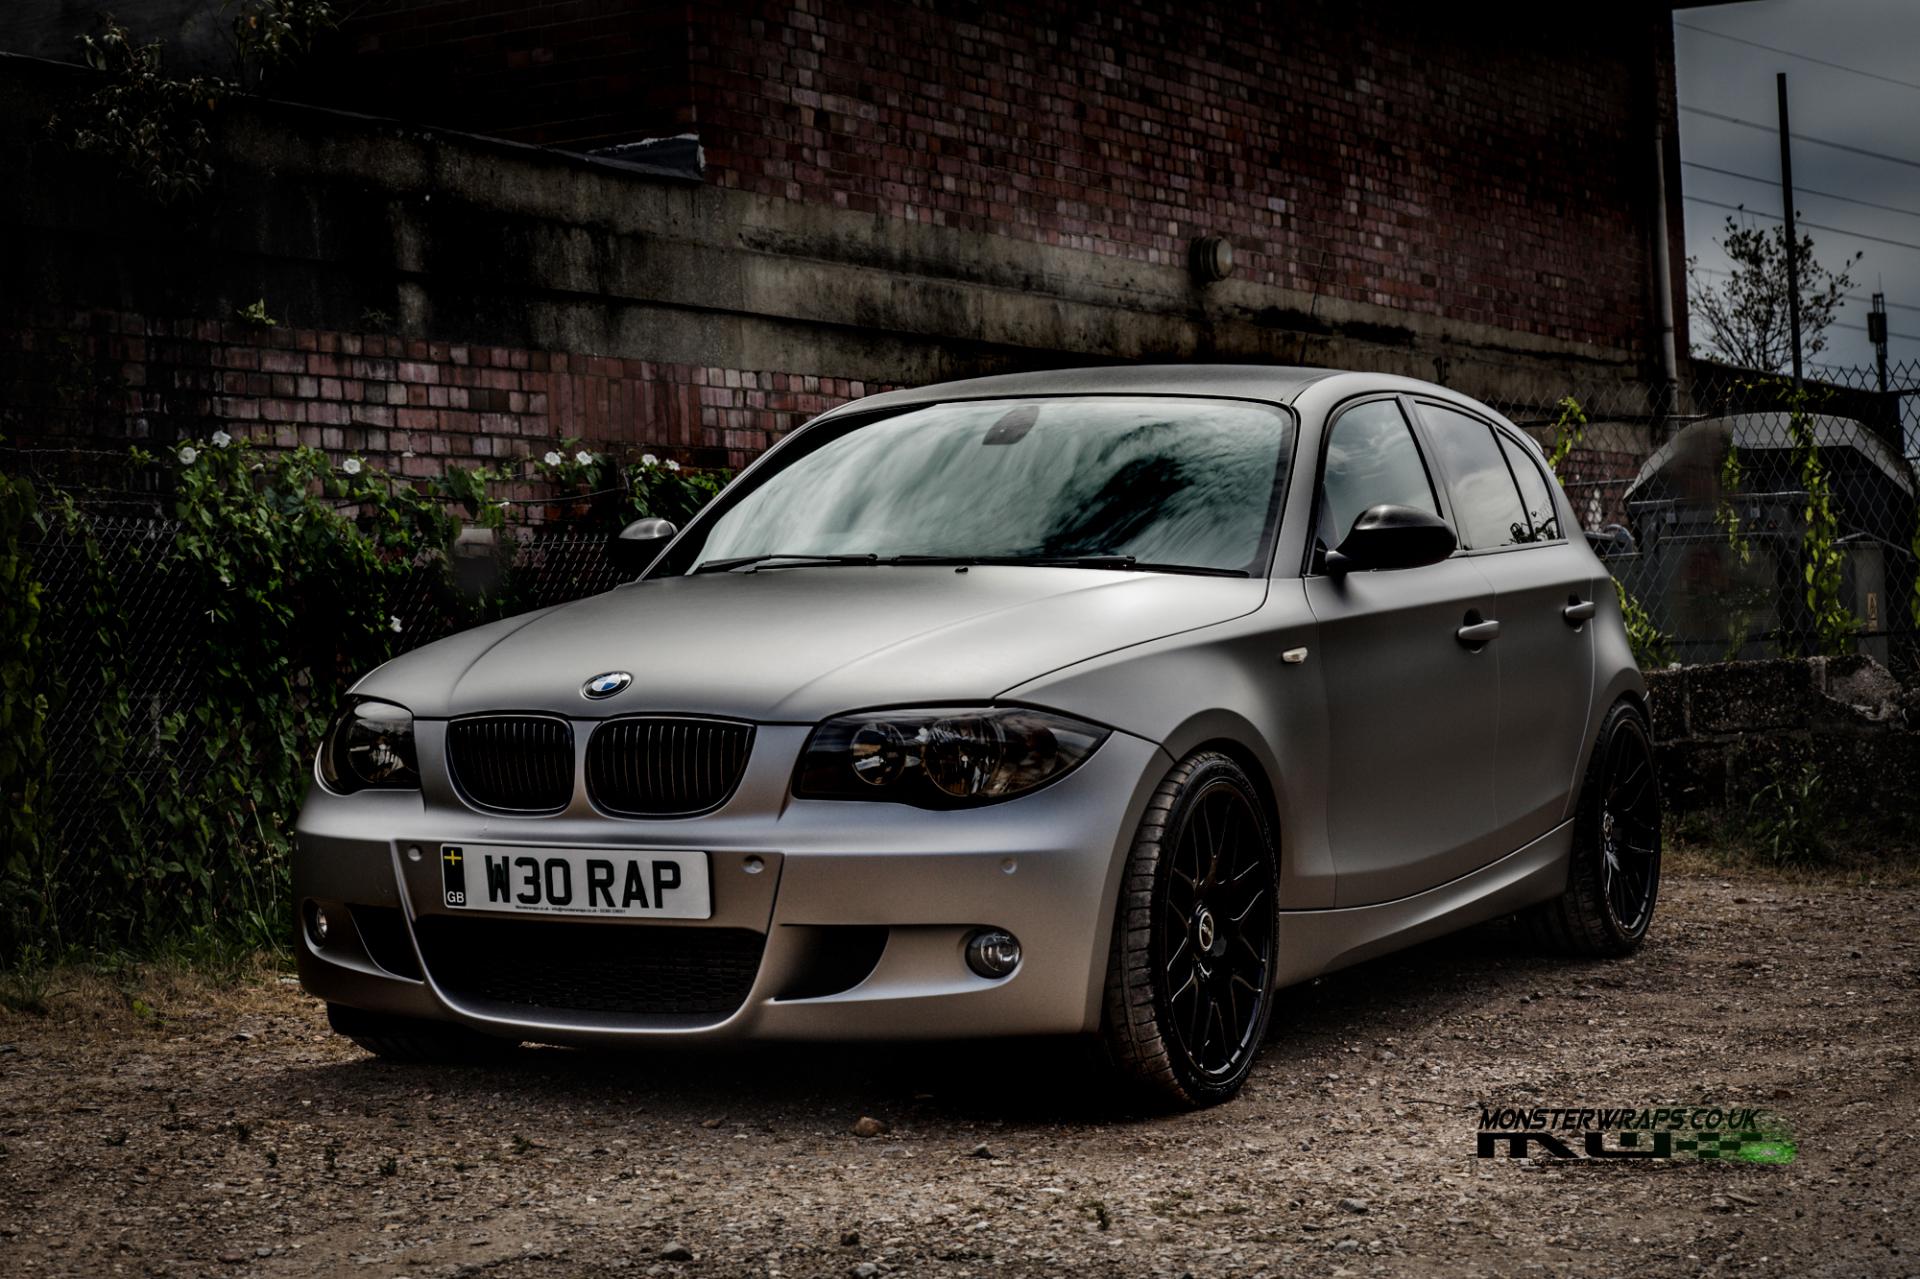 BMW 1 series e87 Matte grey aluminium wrap